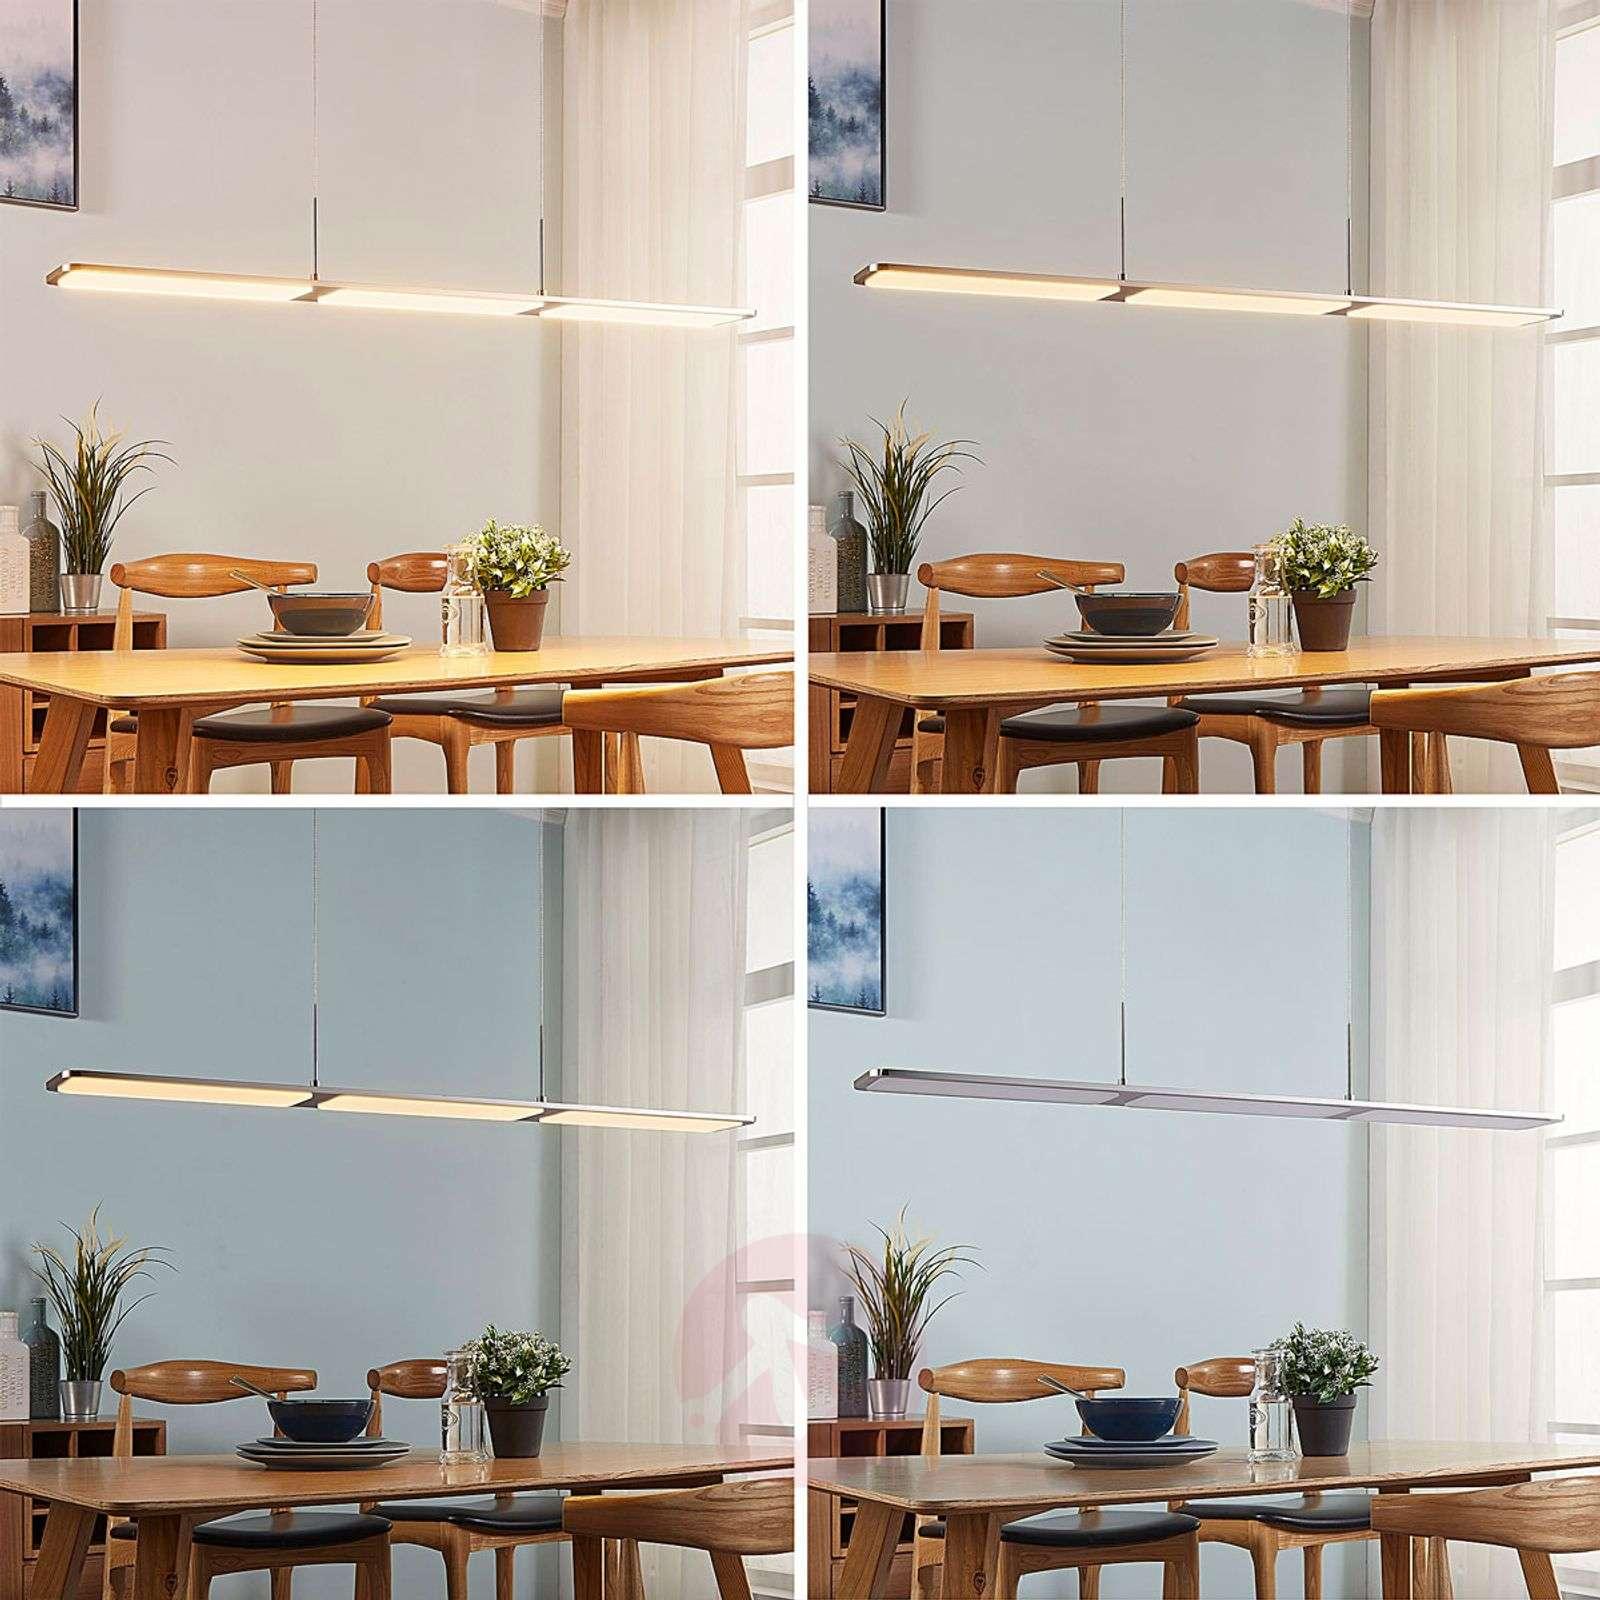 Stephanie linear LED pendant lamp, dimmable-9621419-01